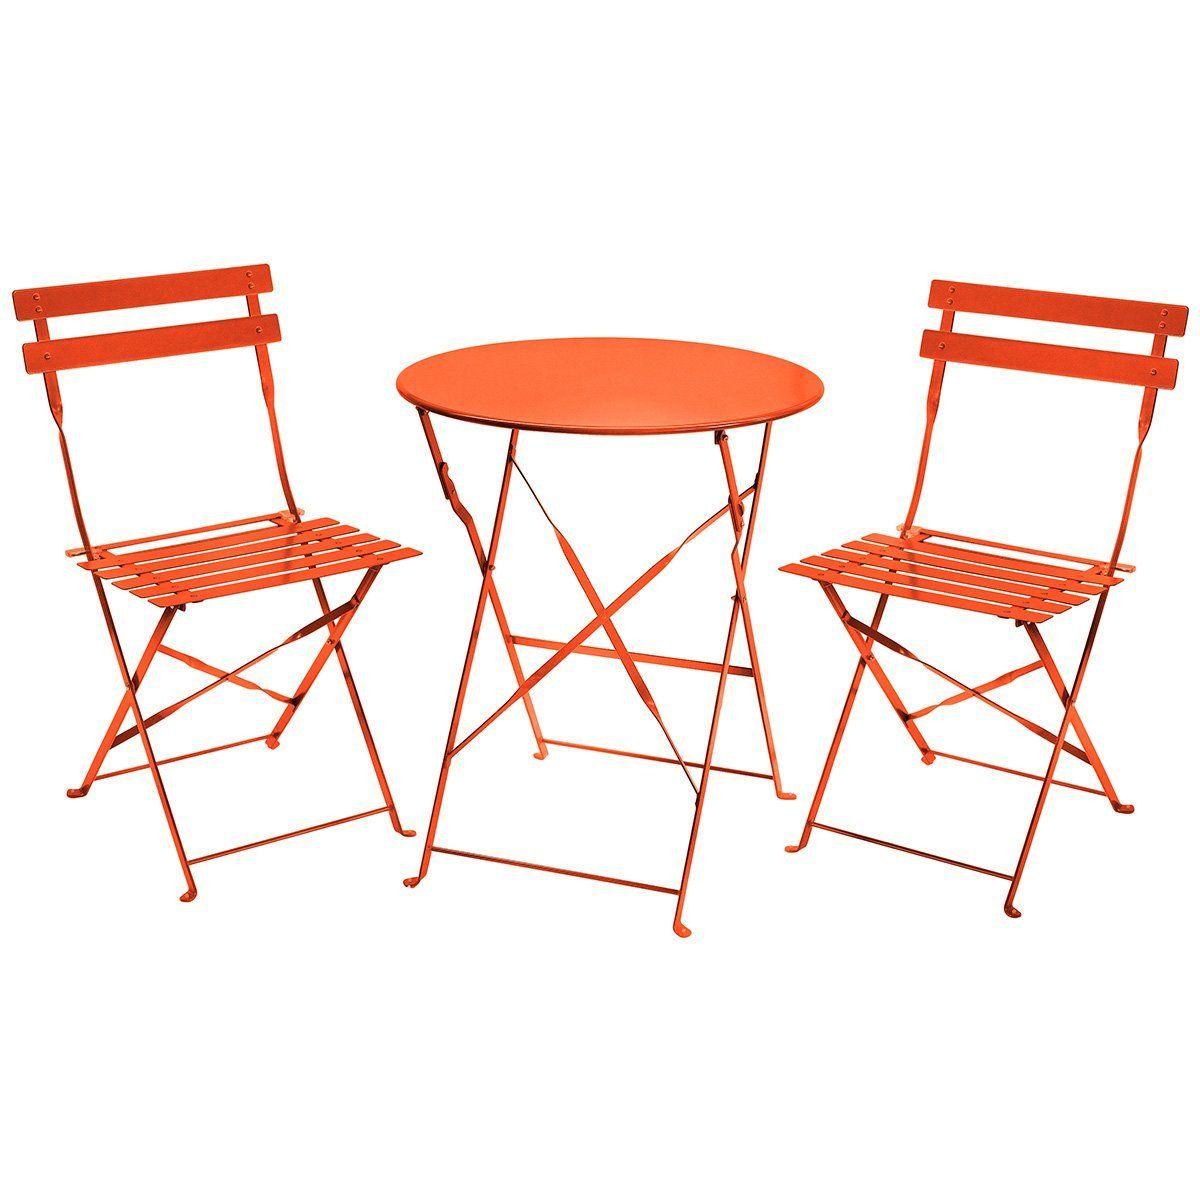 Charles Bentley 3 Piece Folding Metal Bistro Set Garden Patio Furniture Round Table 2 Chairs